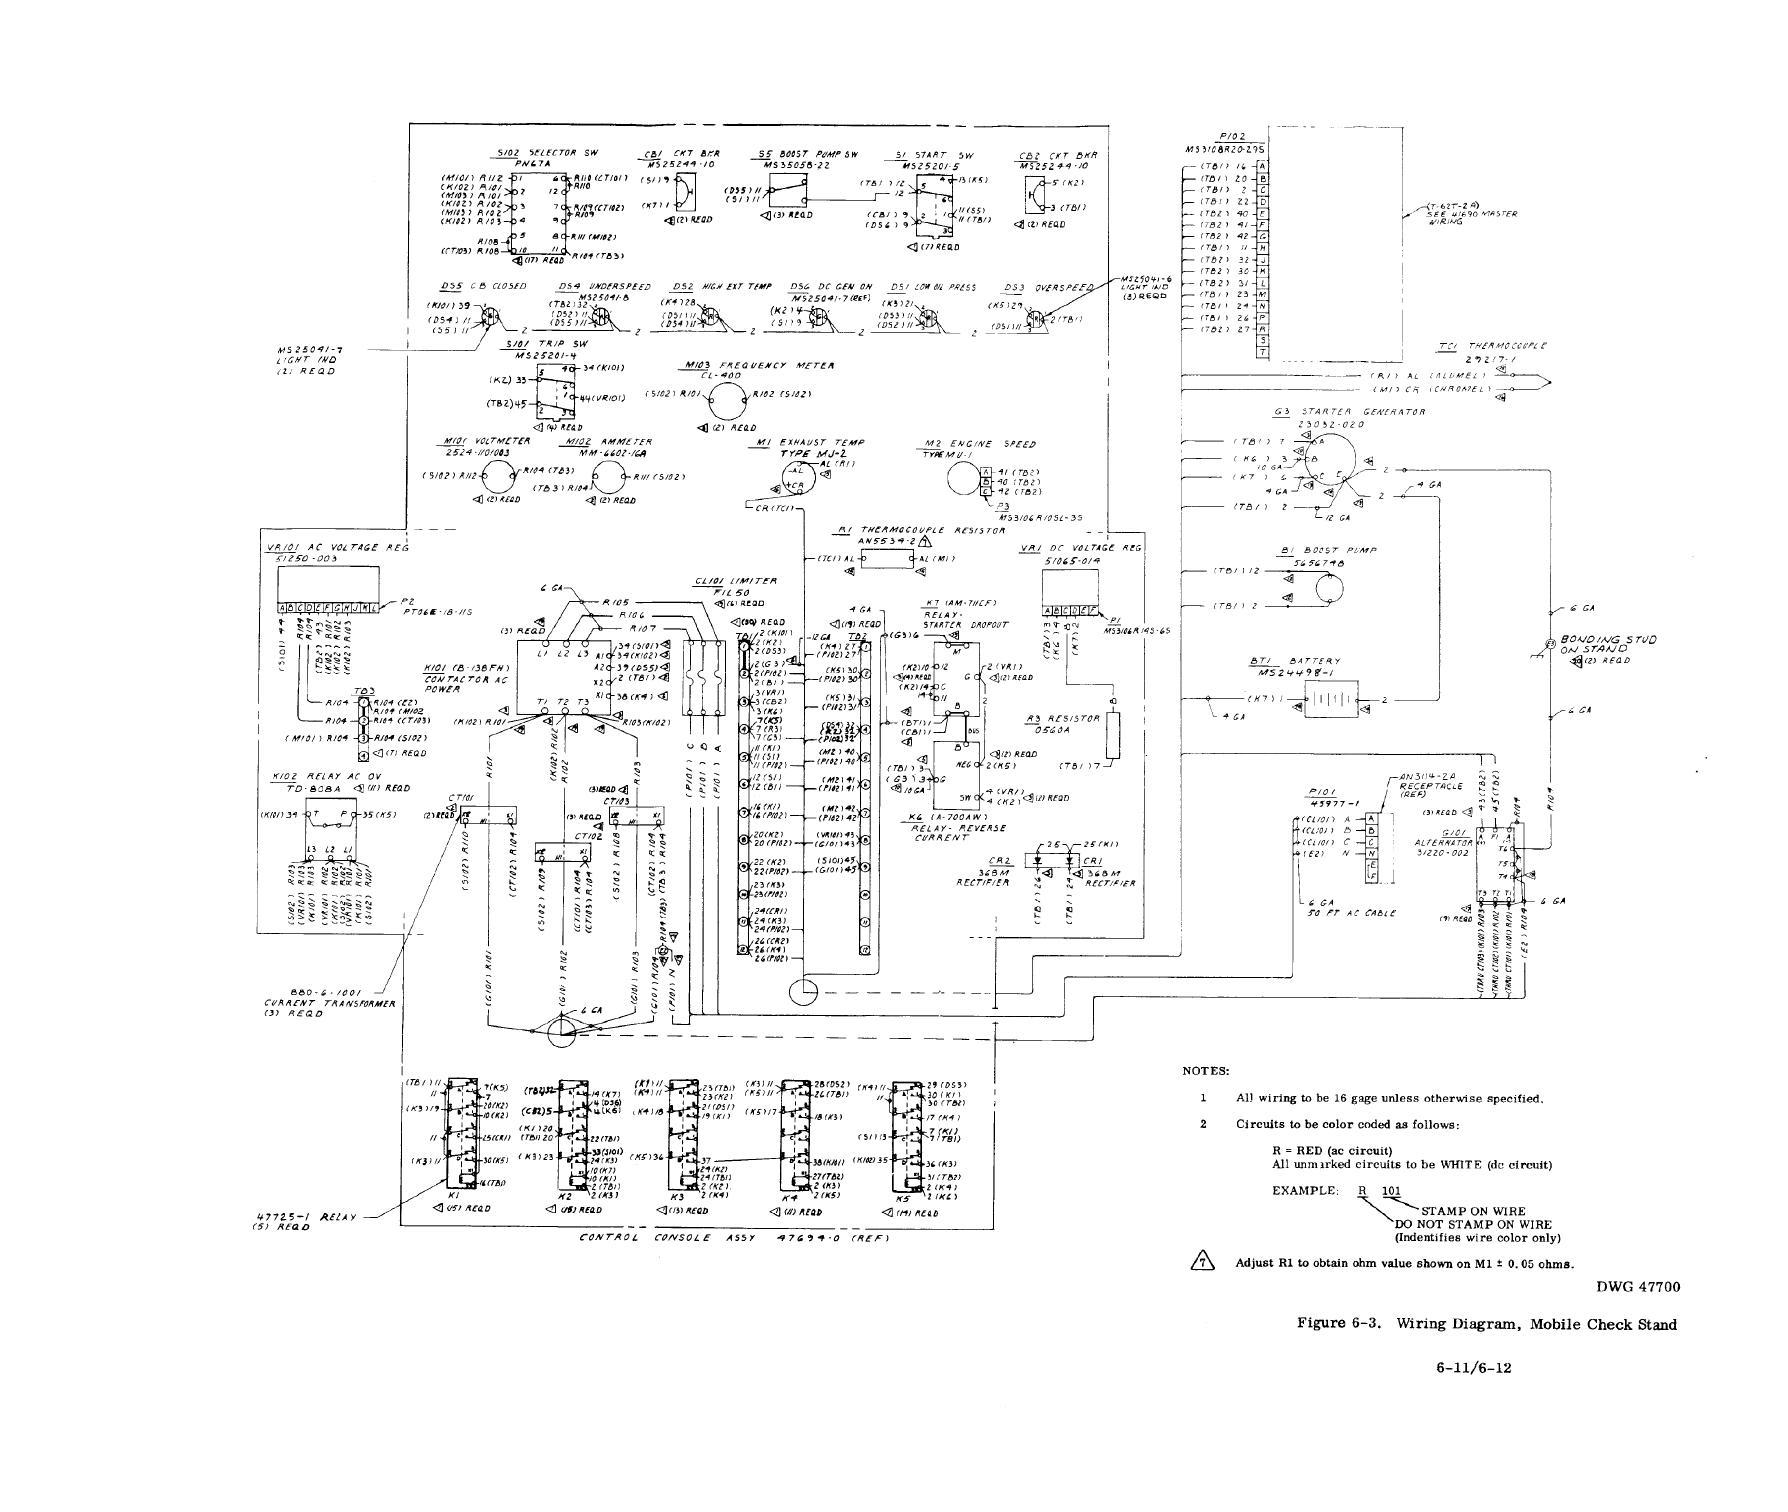 katolight wiring diagram with Generators Wiring Diagram For Mobile on Cummins Diesel Generator Qsb5 Manual in addition 480v Generator Output Wiring besides Generator Auto Start Circuit Diagram in addition Wiring Diagram For Honda Wave 100 in addition Wiring Diagram For Induction Hob.